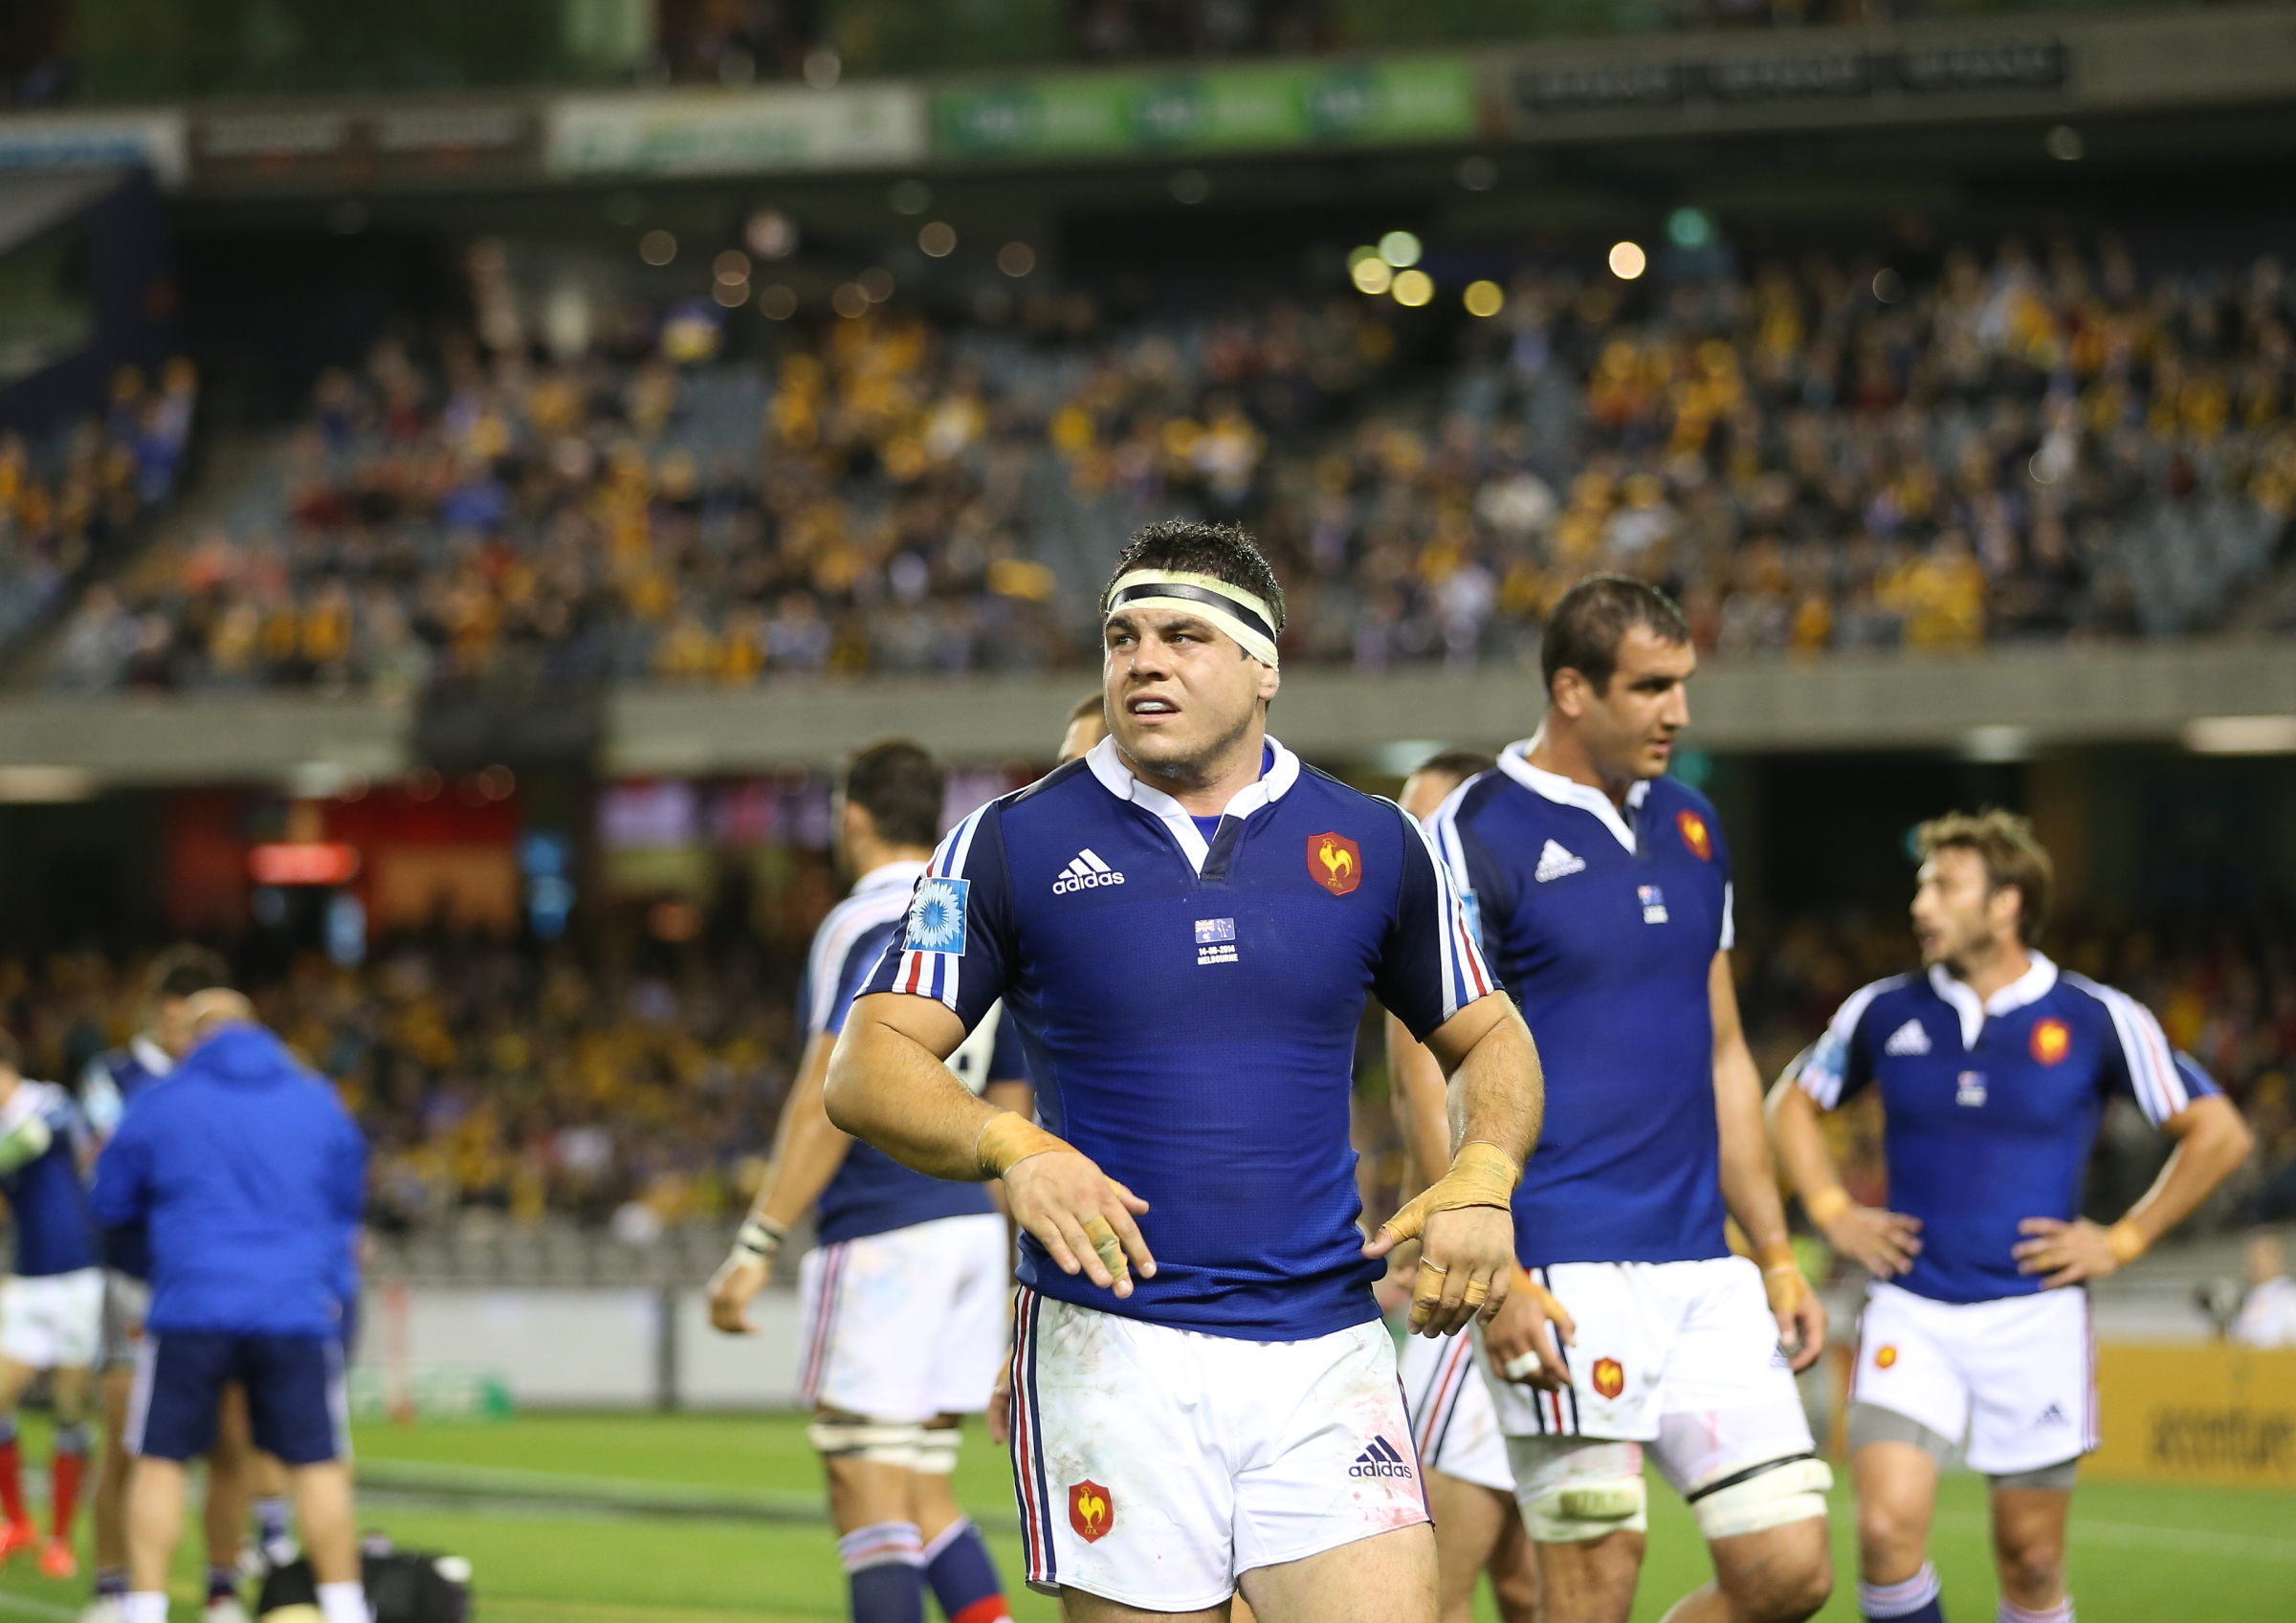 web2-rugby-guilhem-guirado-flickr.jpg